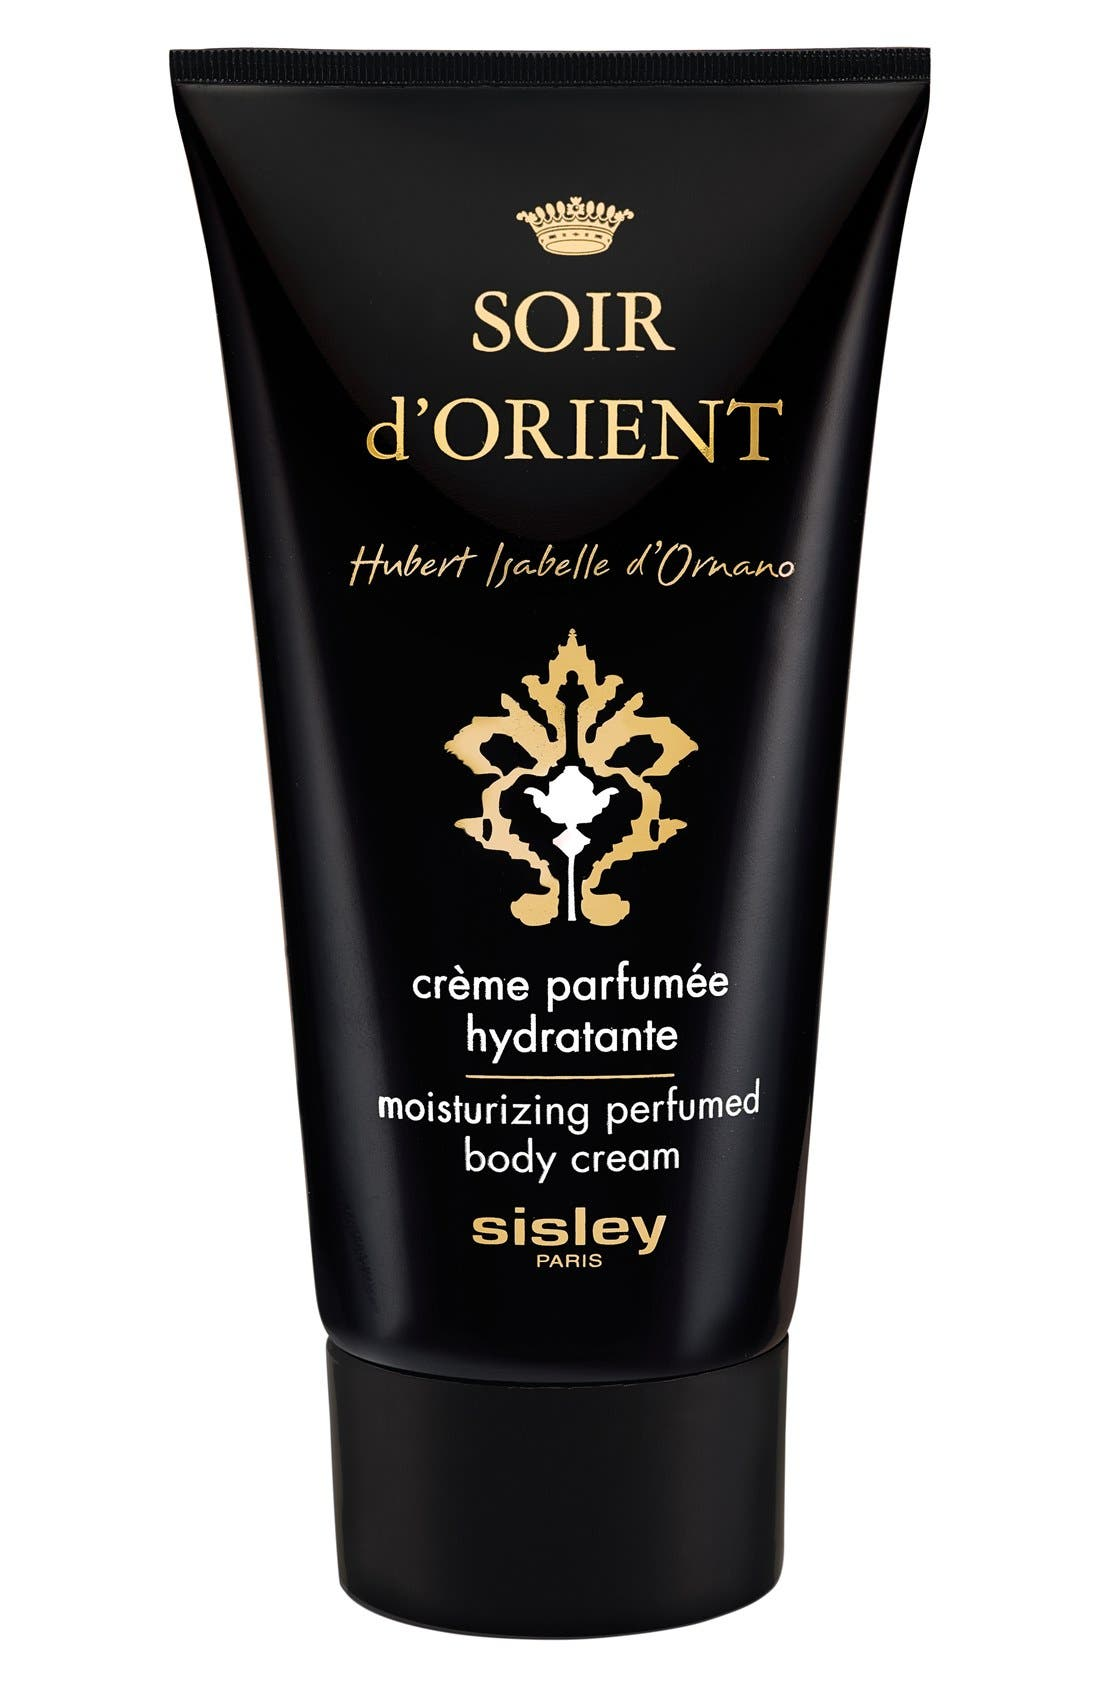 Sisley Paris Soir dOrient Moisturizing Perfumed Body Cream